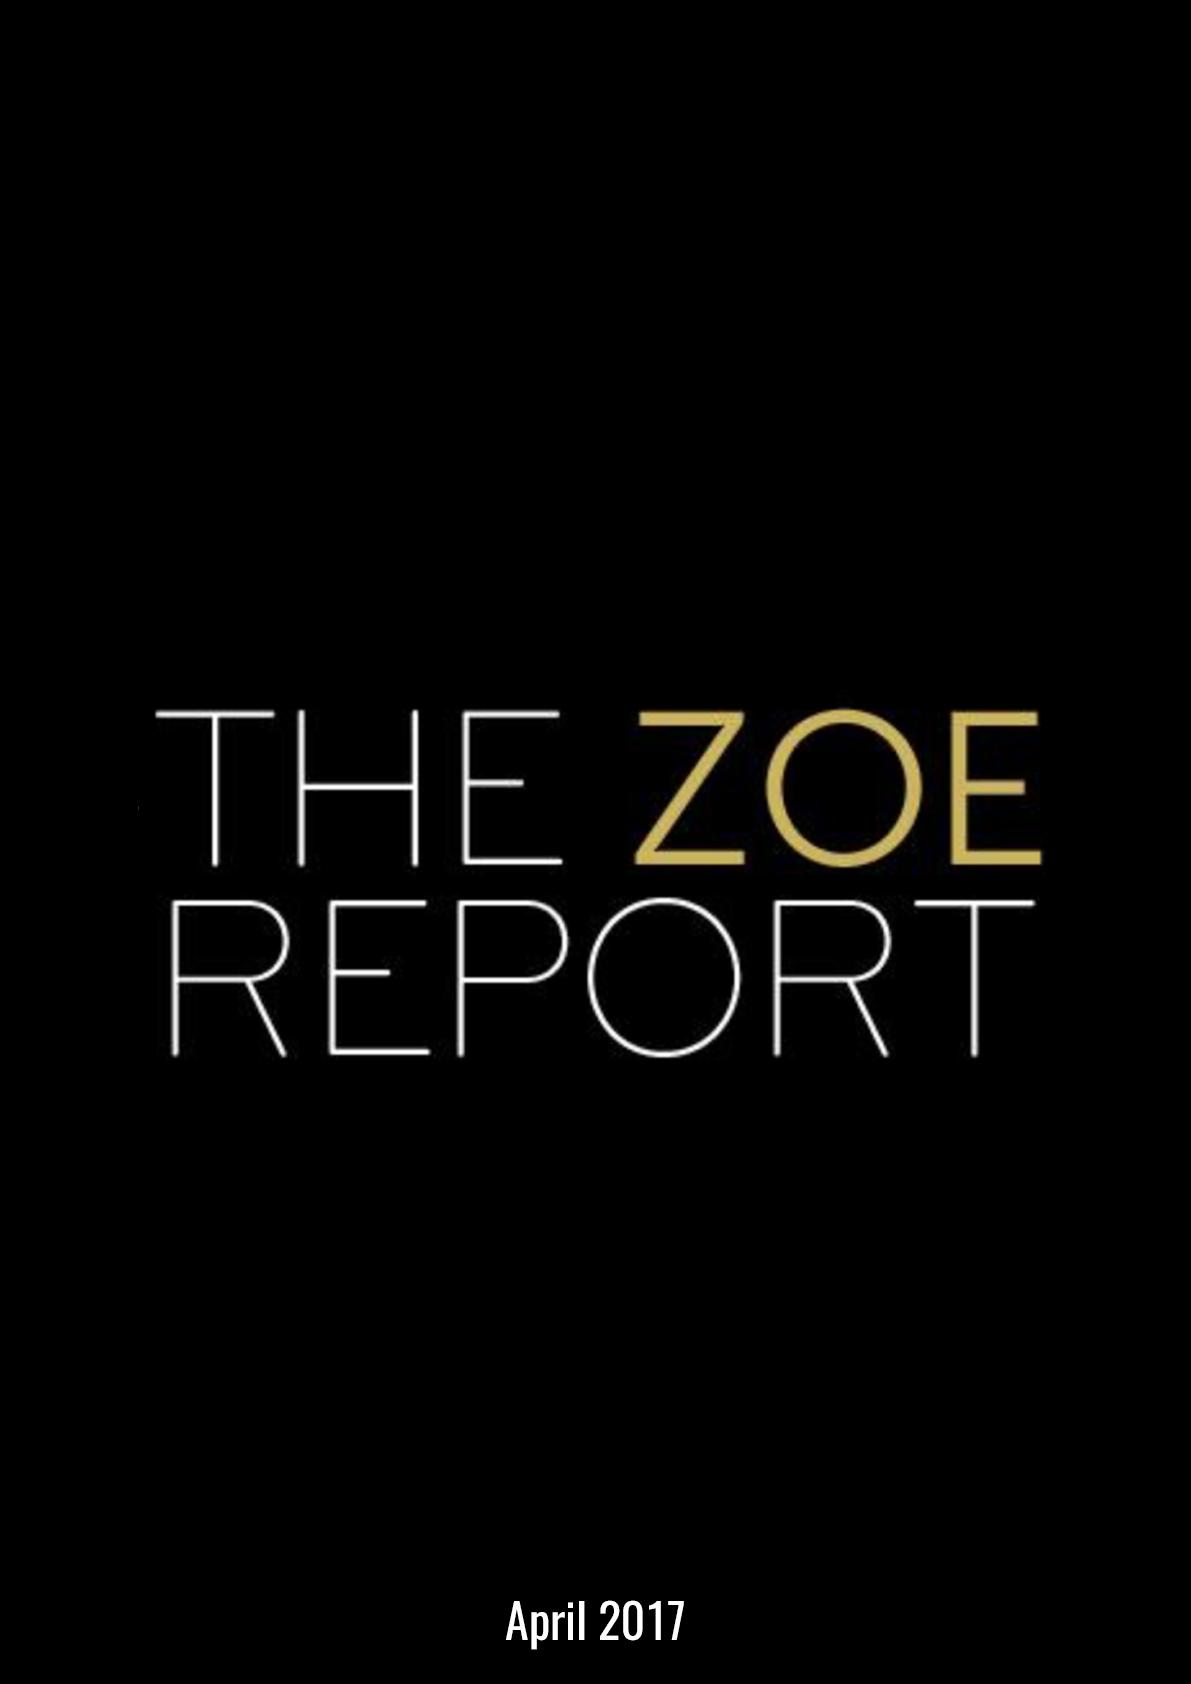 The Zoe Report April 2017.jpg